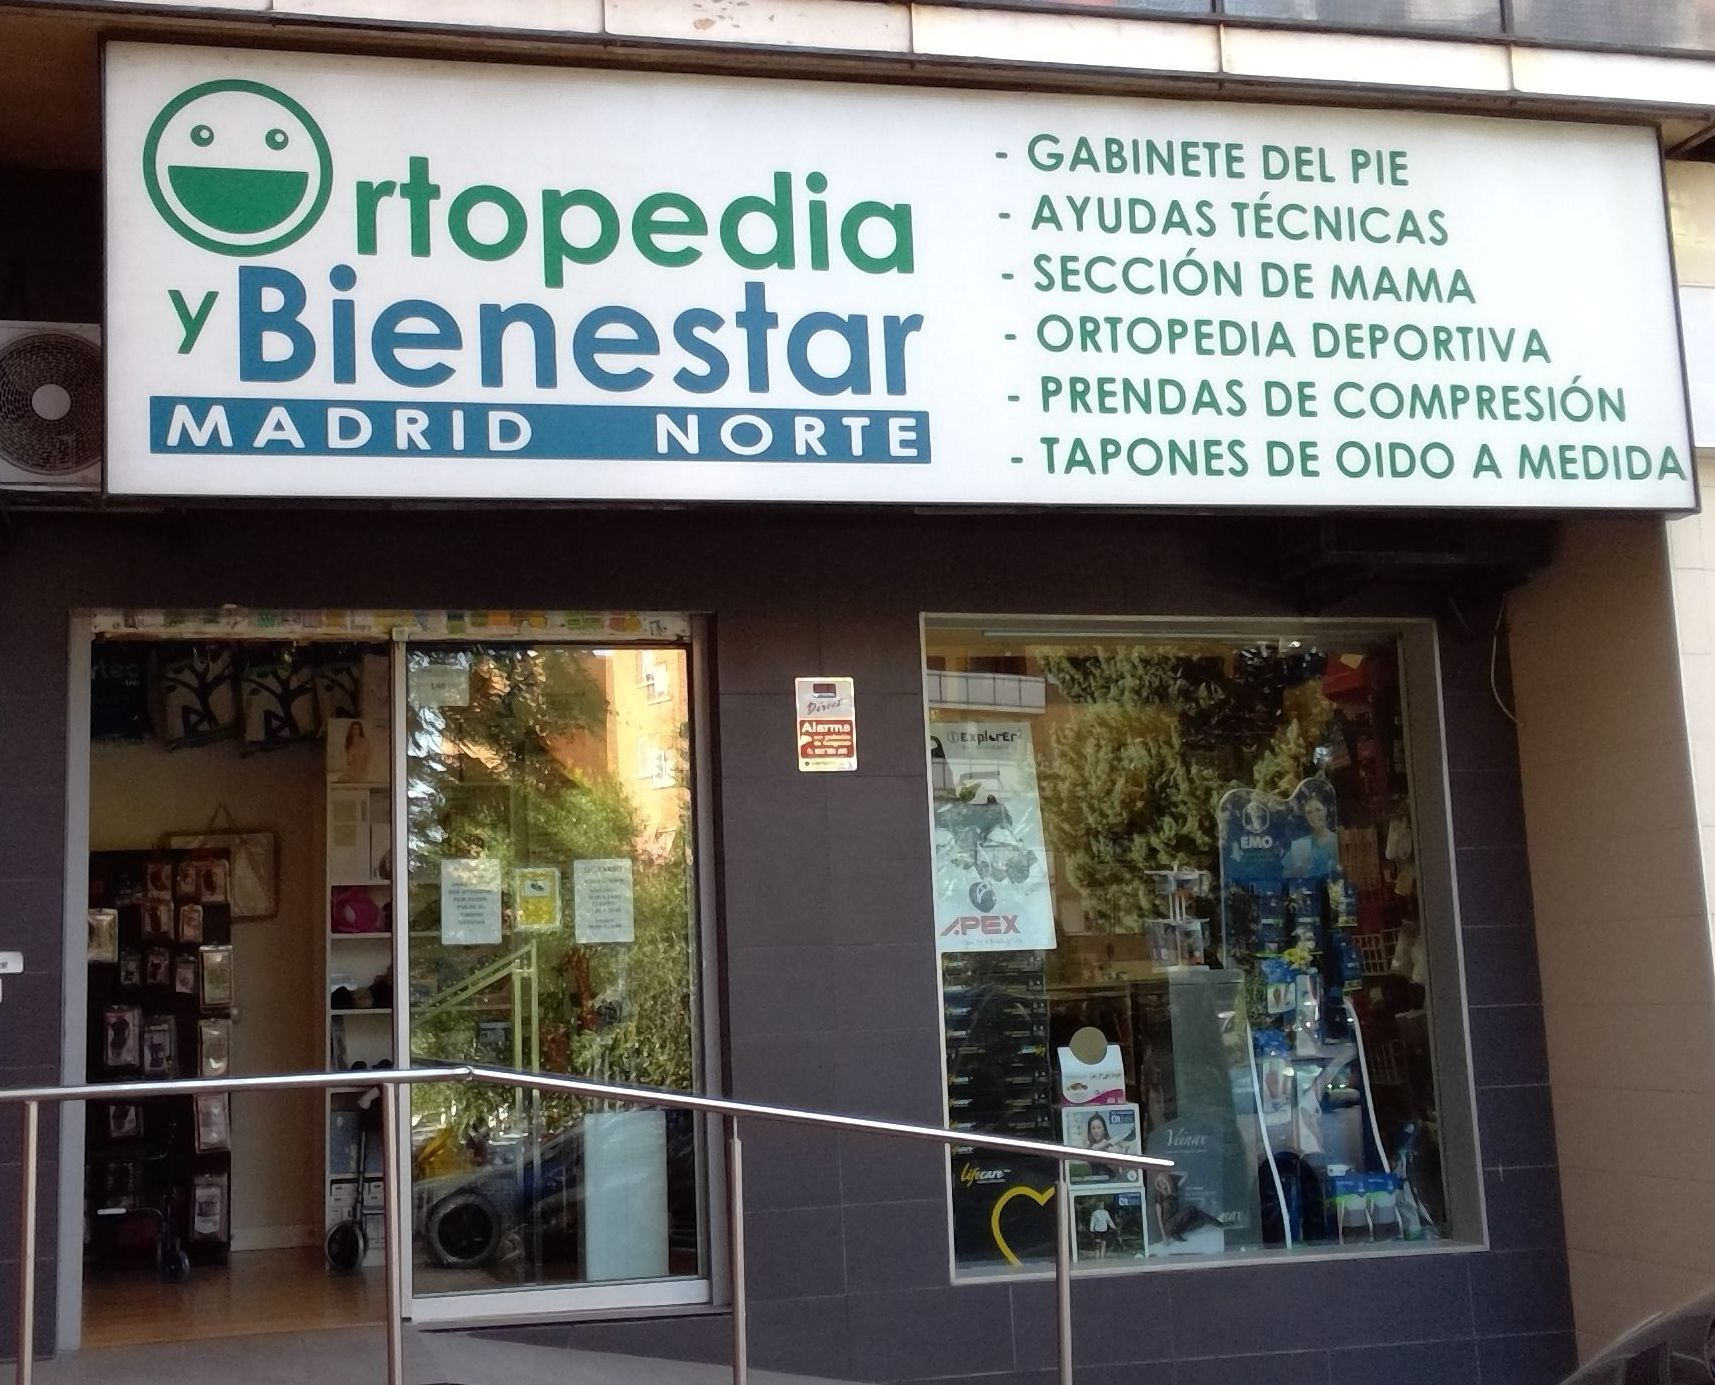 Foto 1 de Ortopedia en Madrid | Ortopedia y Bienestar